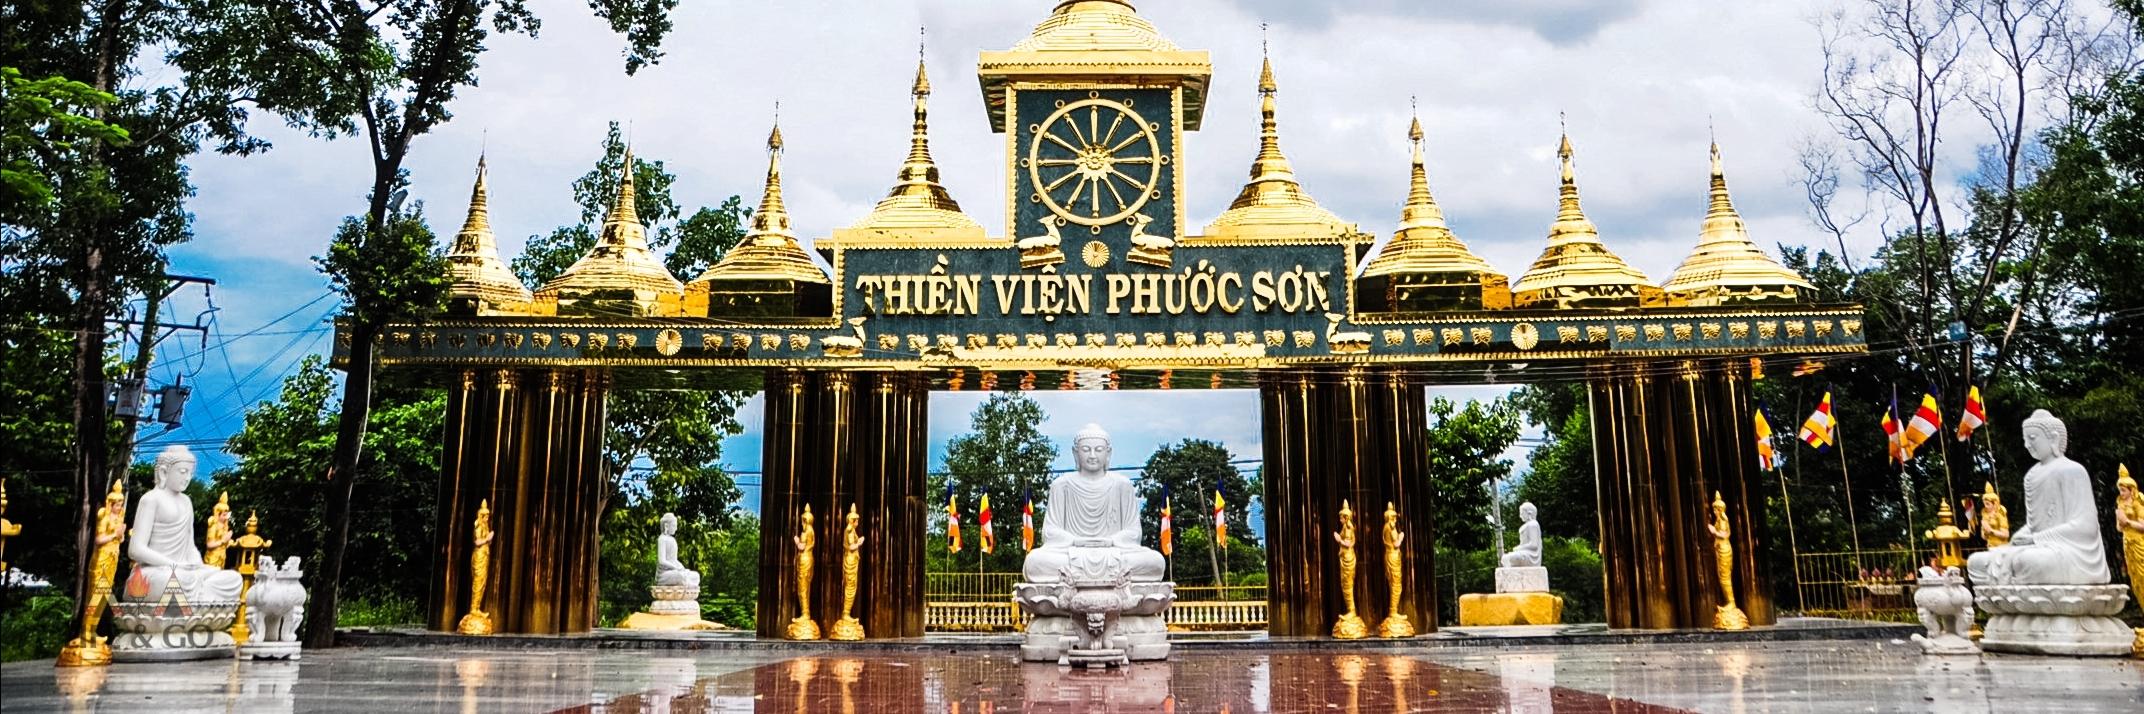 https://gody.vn/blog/lifeandgostudio4271/post/ve-dep-day-ma-mi-cua-ngoi-chua-co-chanh-dien-lon-nhat-viet-nam-4593